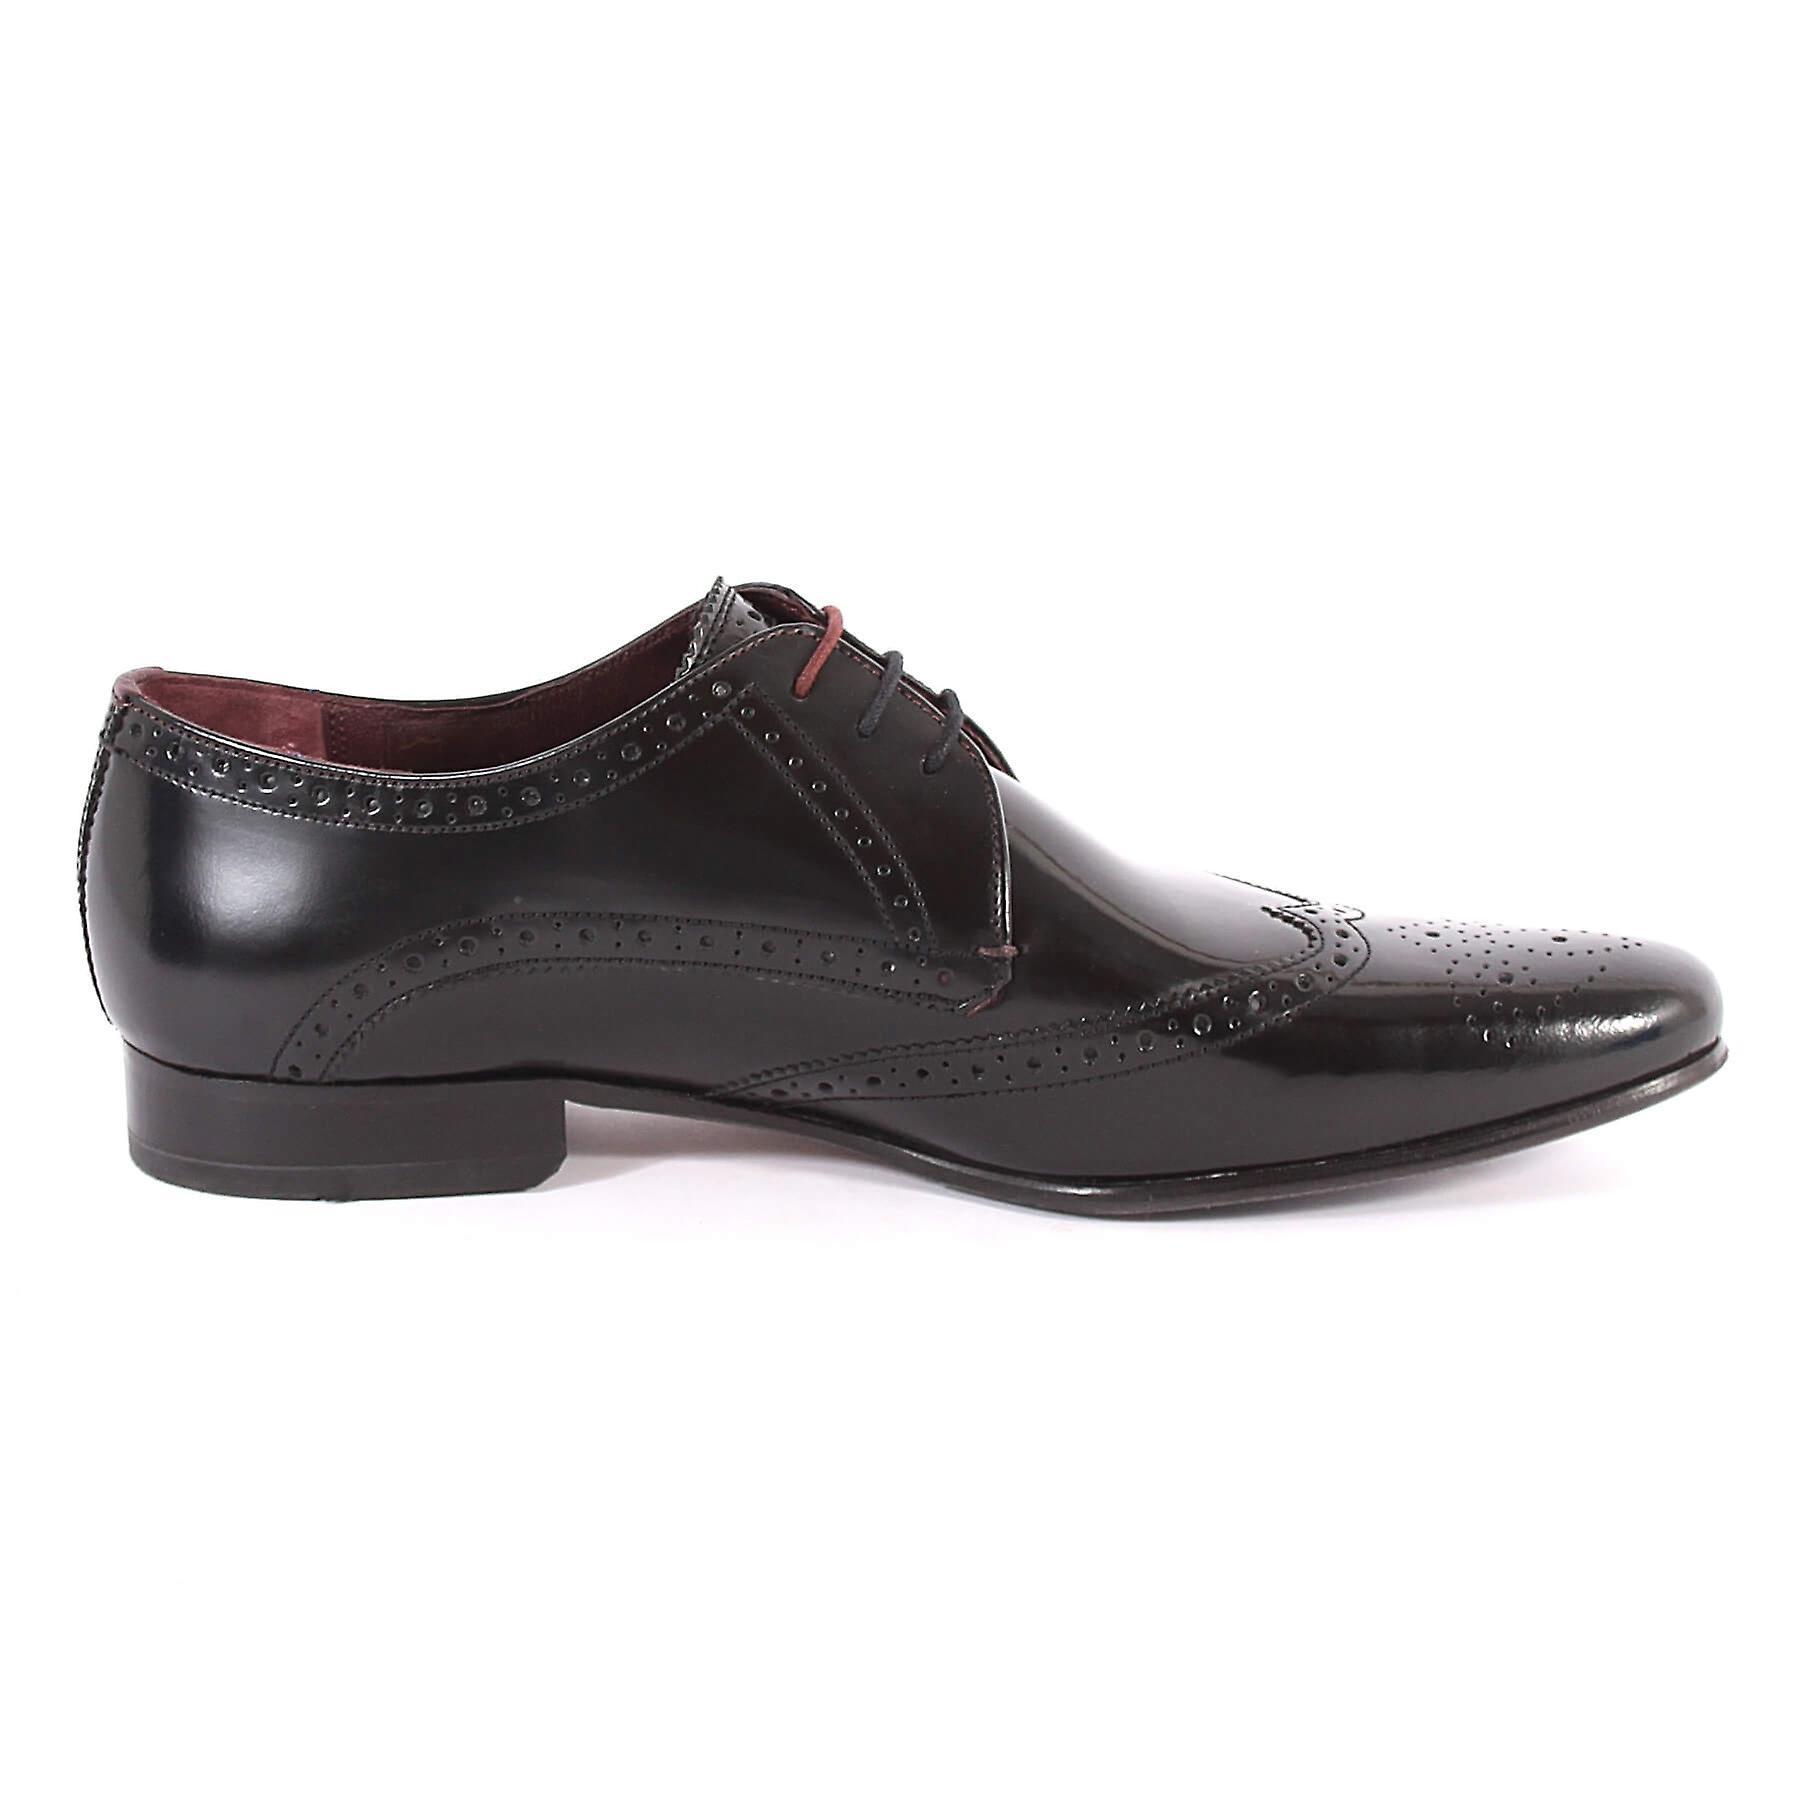 bf23d331a83c6 Home   Men   Shoes   Formal   Ted Baker Men s Albbin Leather Lace Up Formal  Shoe Black